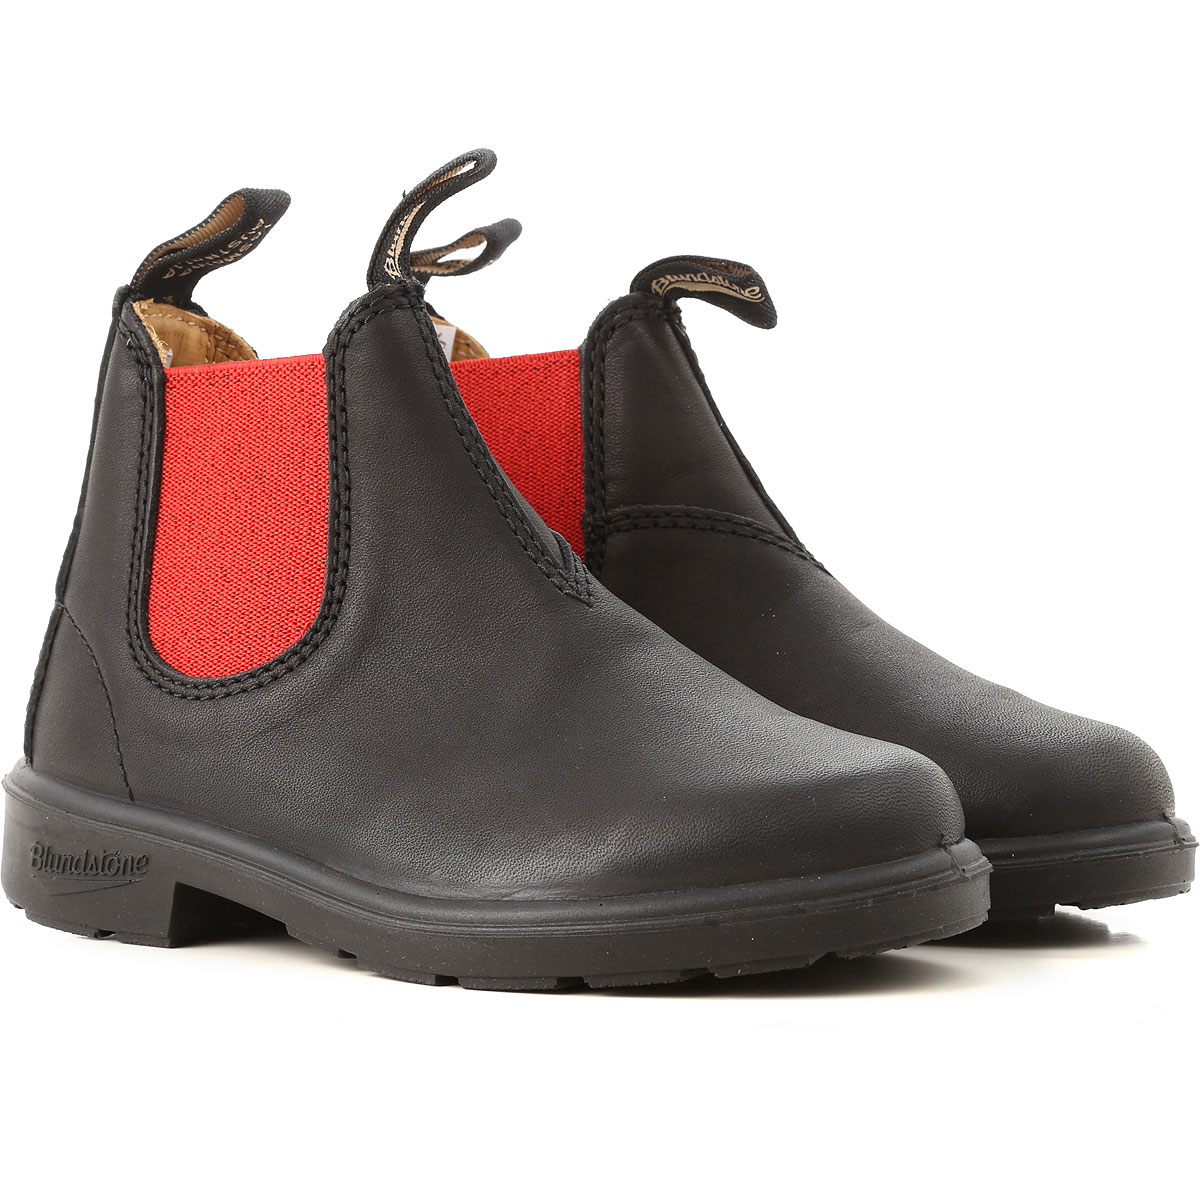 Image of Blundstone Kids Shoes for Boys, Black, Leather, 2017, UK 7 - US 7.5 - EU 24 UK 8 - US 8.5 - EU 25.5 UK 9 - US 9.5 - EU 26.5 UK 10 - US 10.5 - EU 28 UK 11 - UK 11.5 - EU 29 UK 12 - US 12.5 - EU 30.5 UK 13 - US 13.5 - EU 32